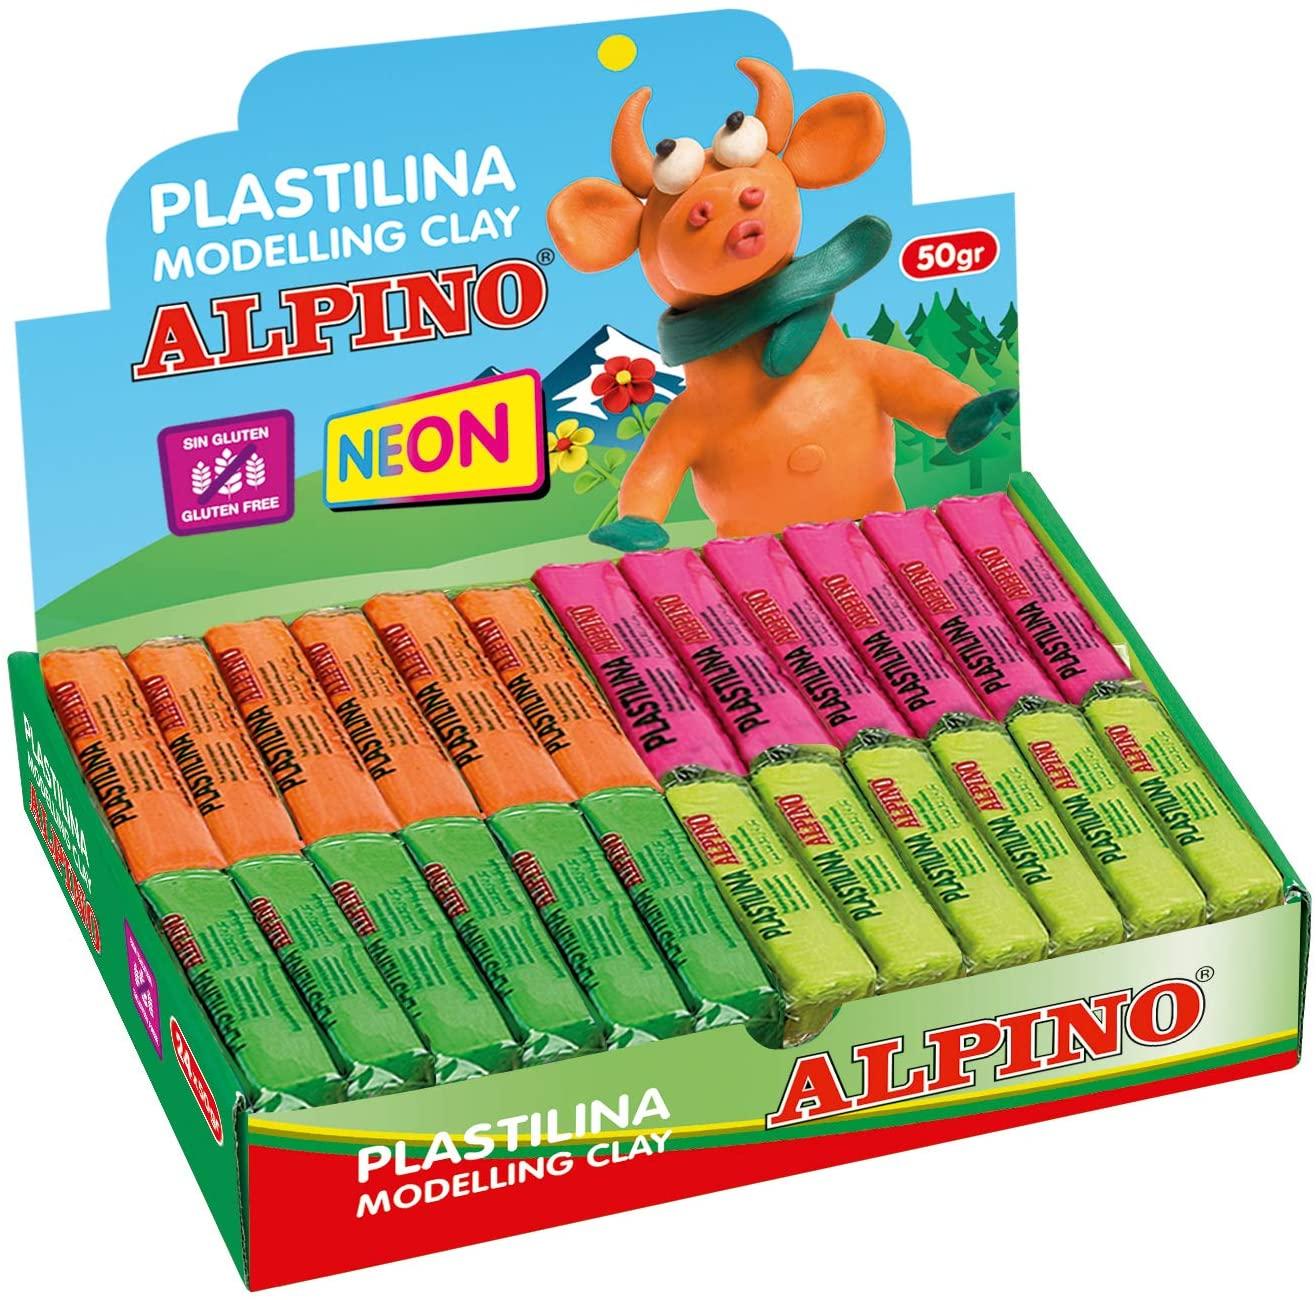 Alpino expositor 24 unidades de plastilina